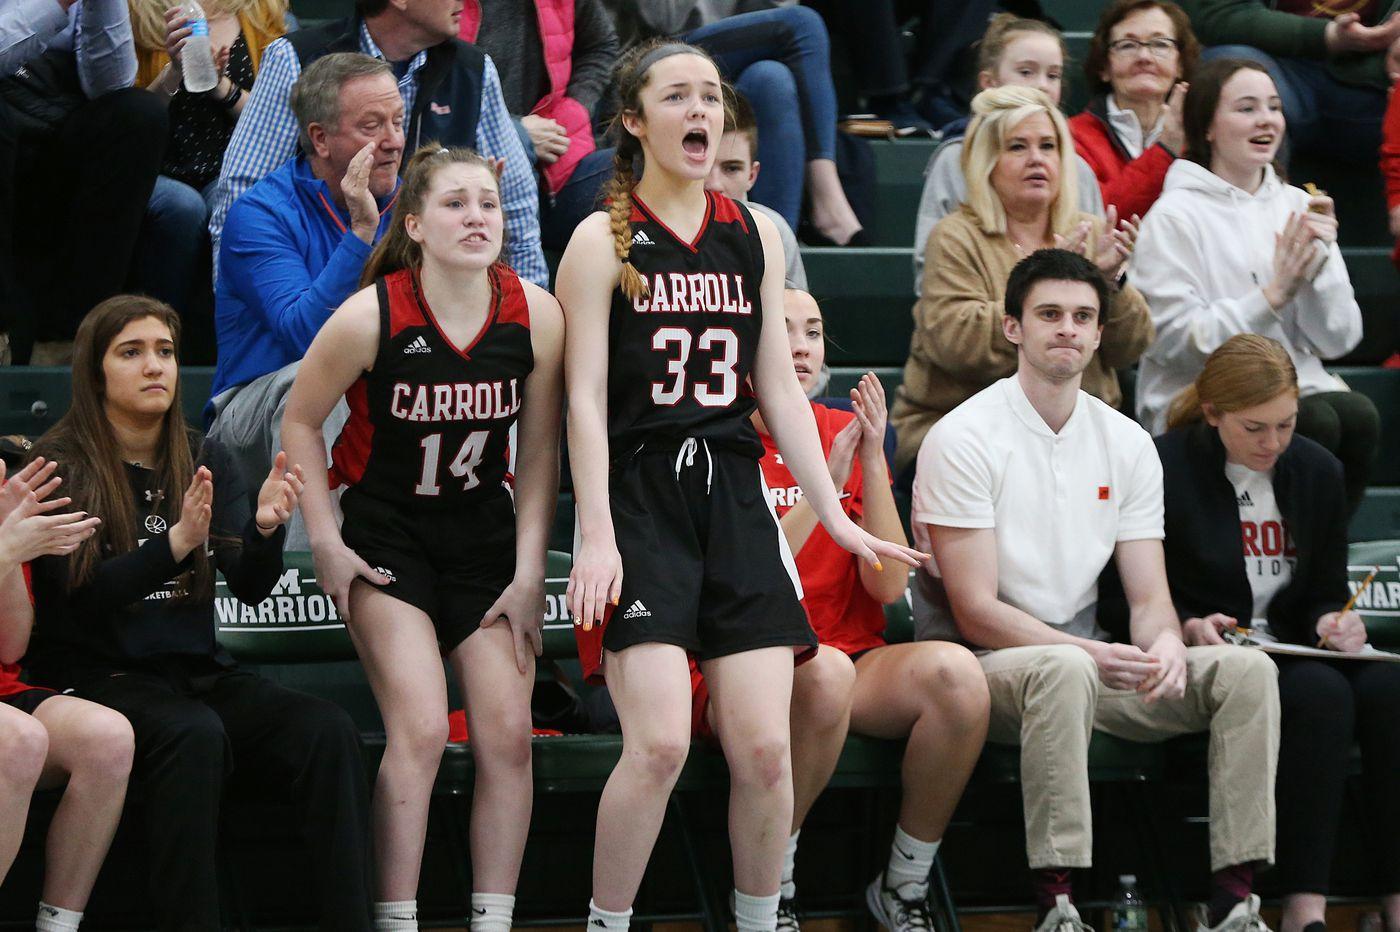 Pennsylvania high school sports done for the school year, PIAA announces